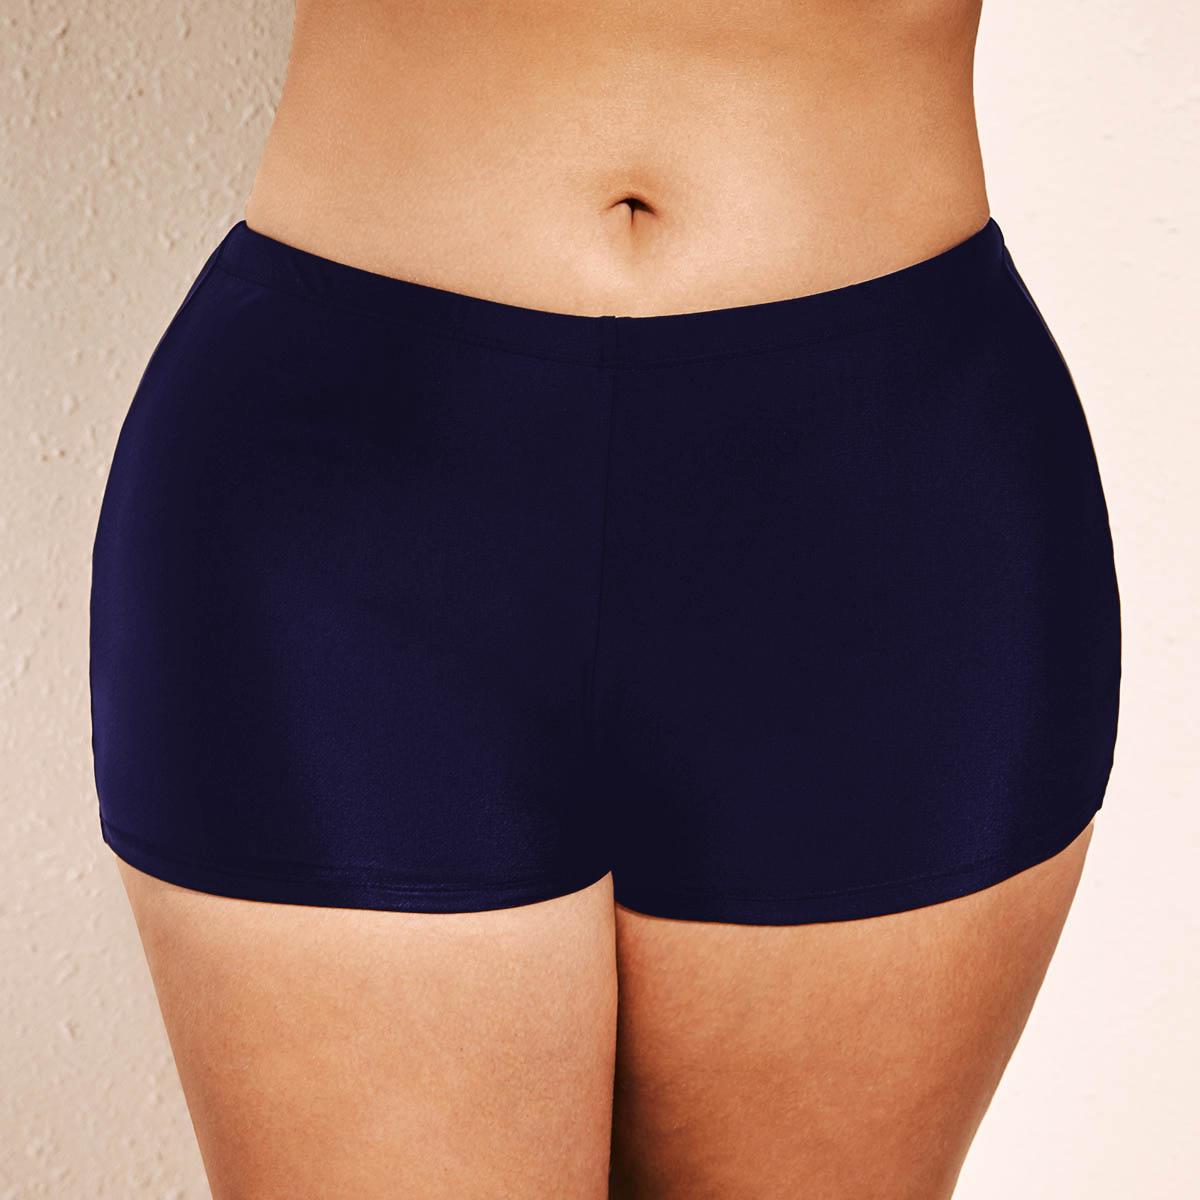 ROTITA Plus Size Navy Blue Mid Waist Swimwear Shorts